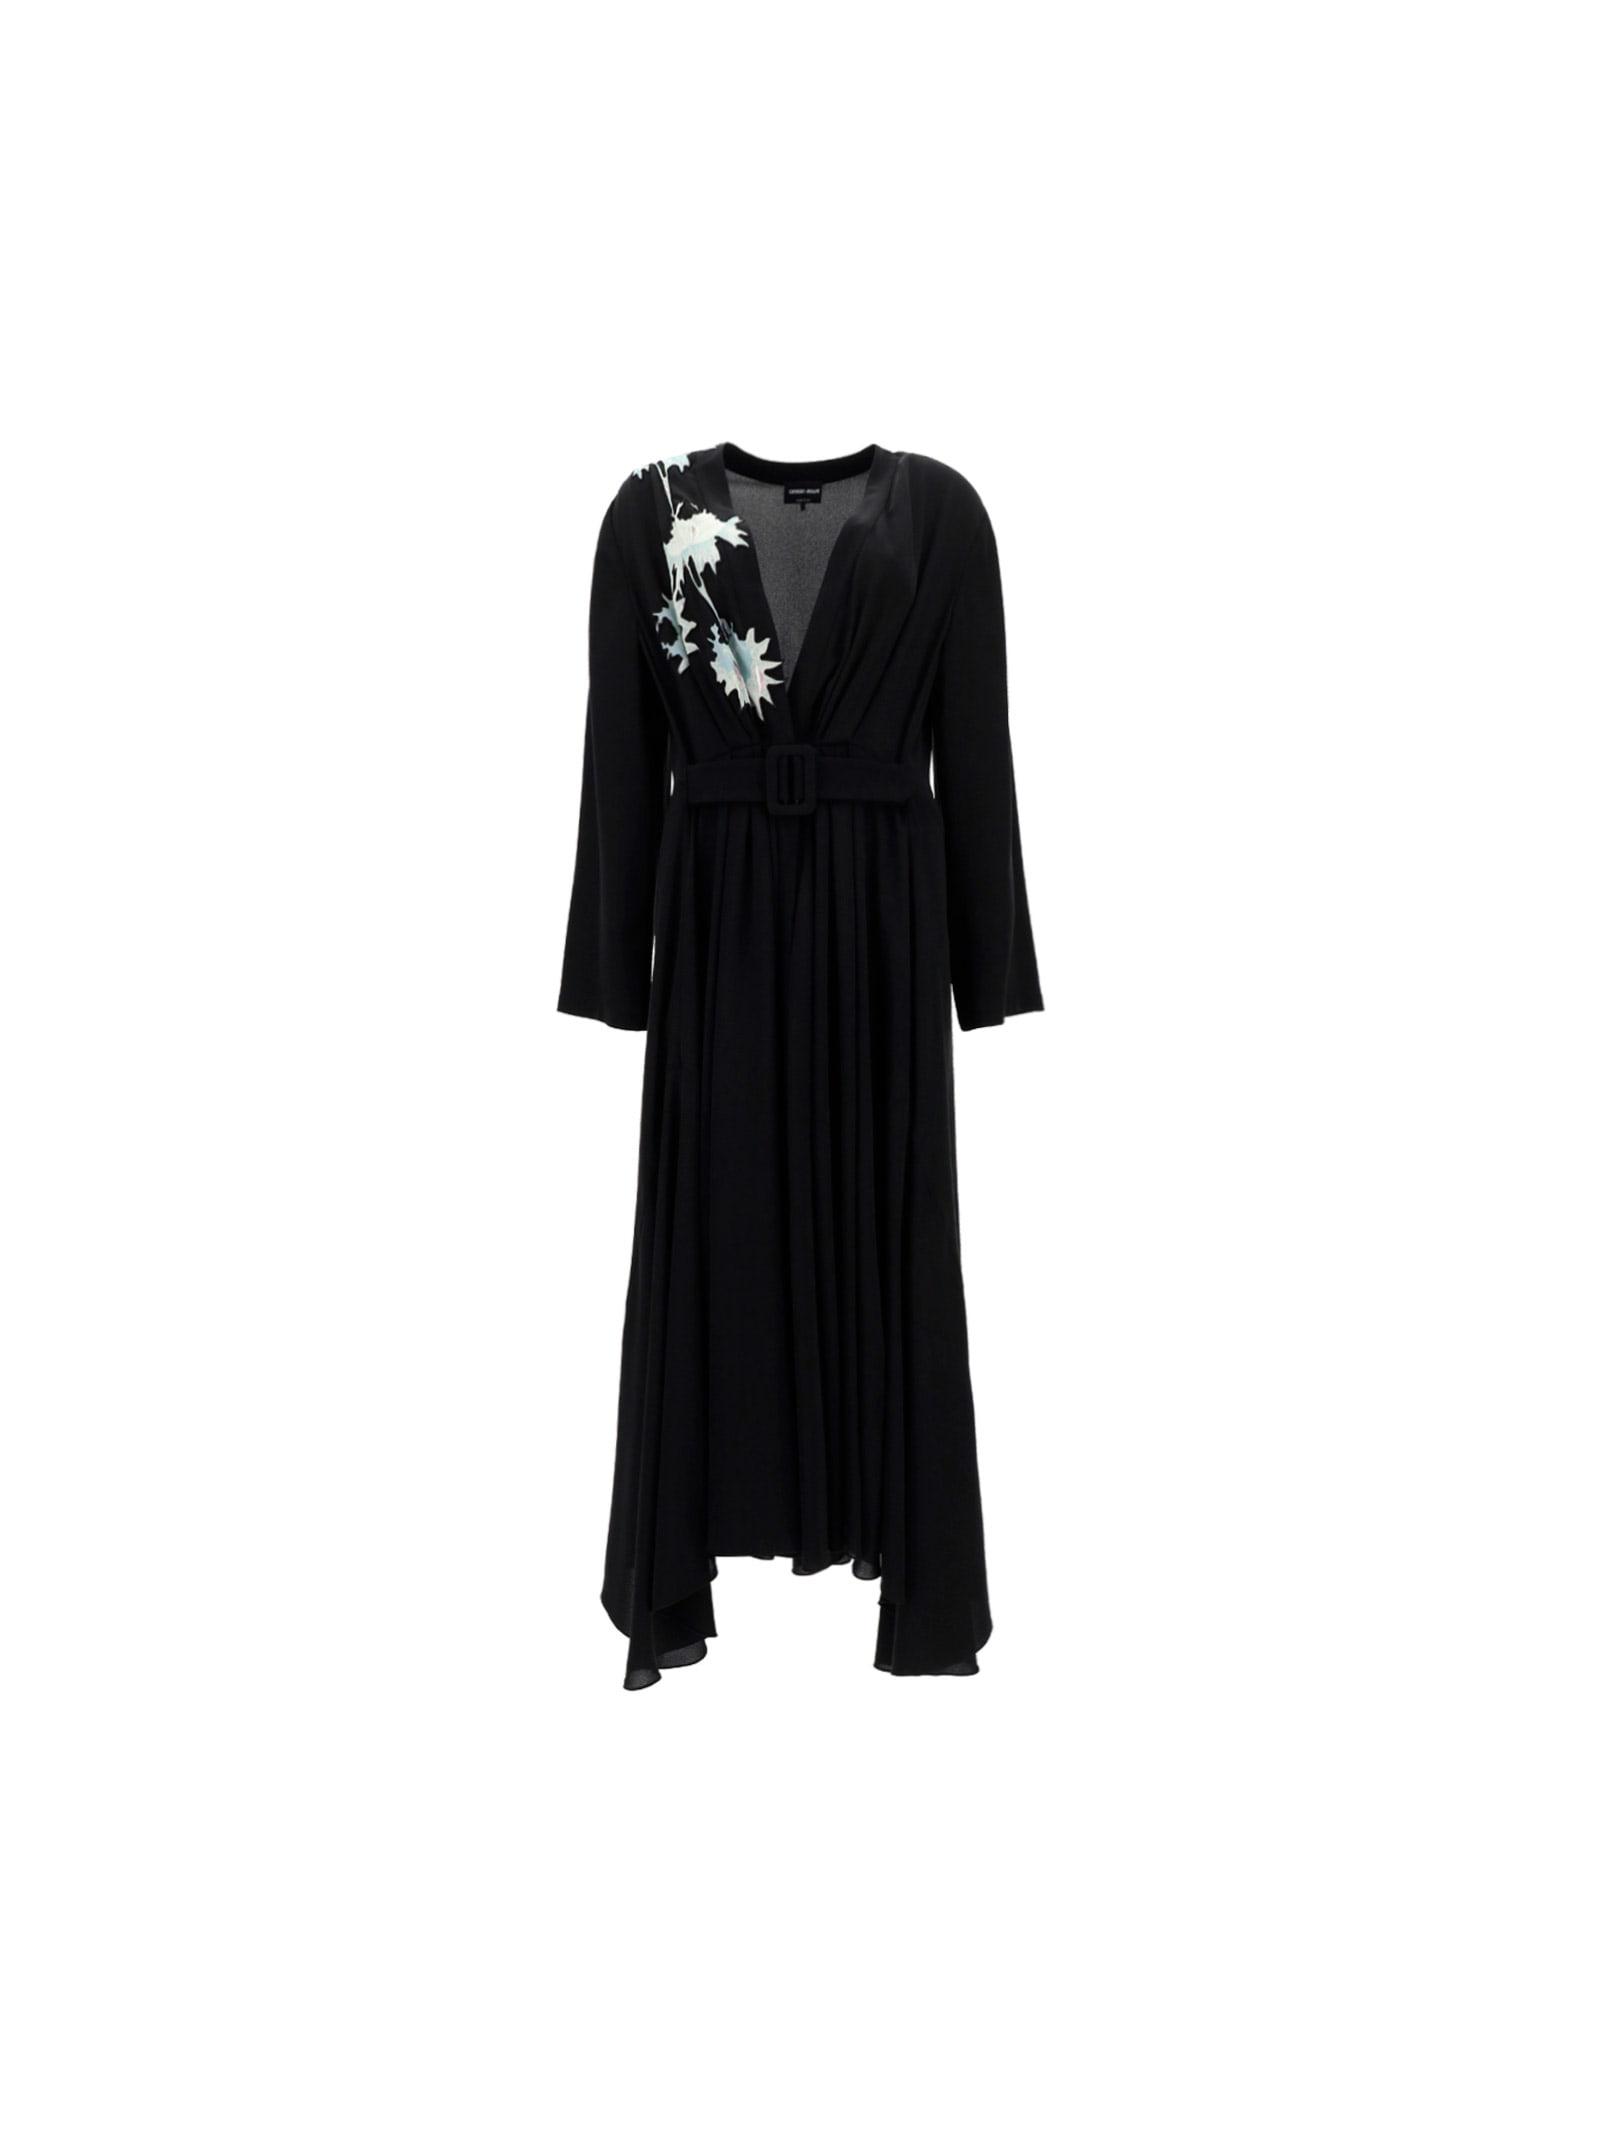 Giorgio Armani Gowns DRESS